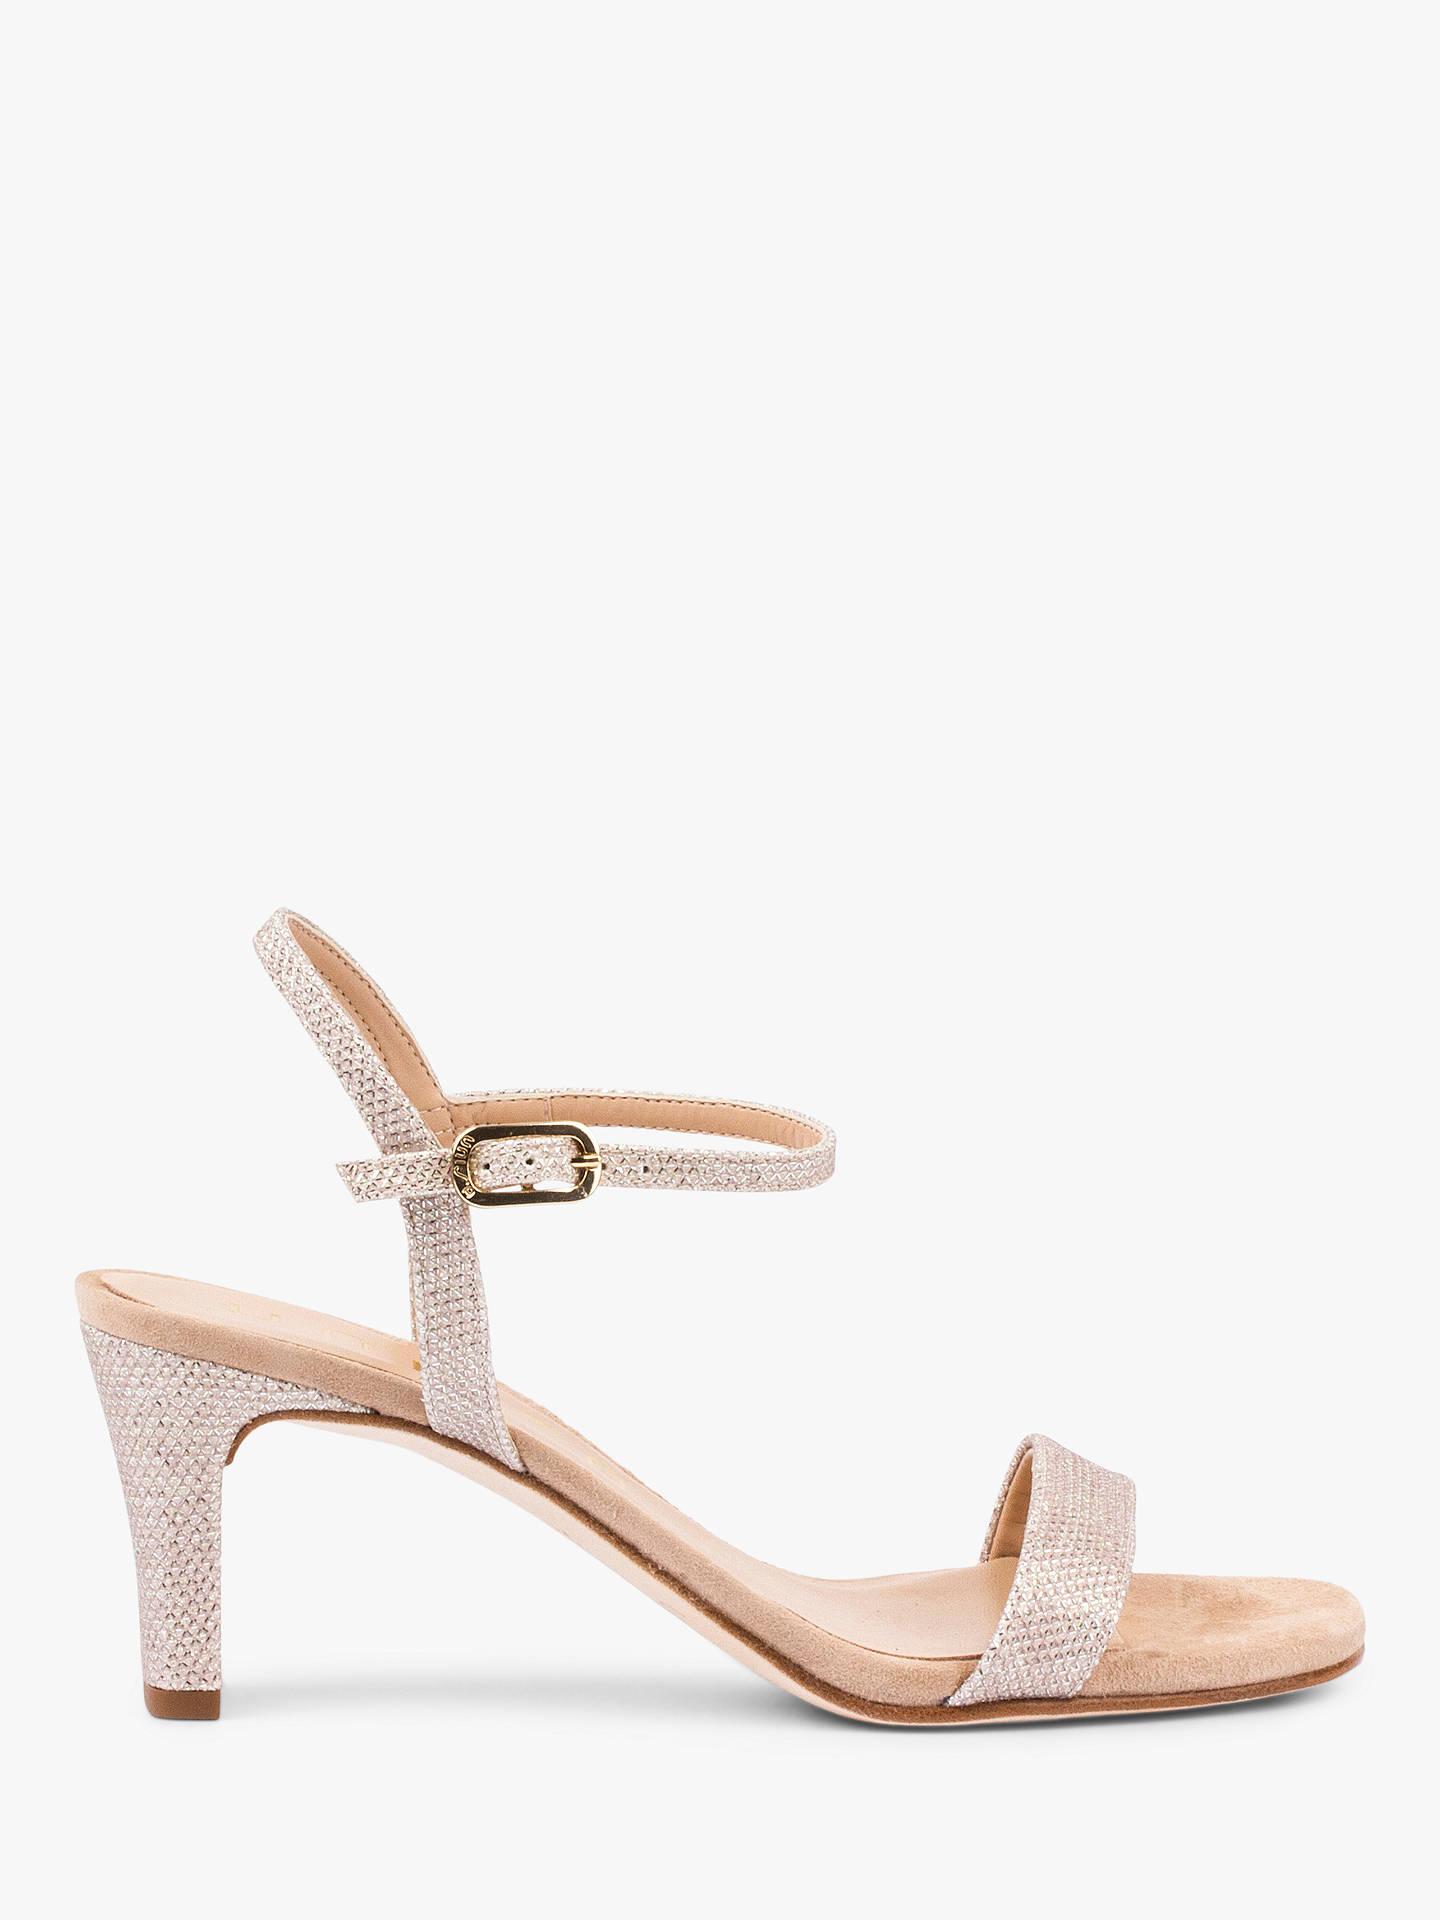 9fb88dcdc4b Unisa Mabre Shimmer Ankle Strap Heeled Sandals, Neutral at John ...